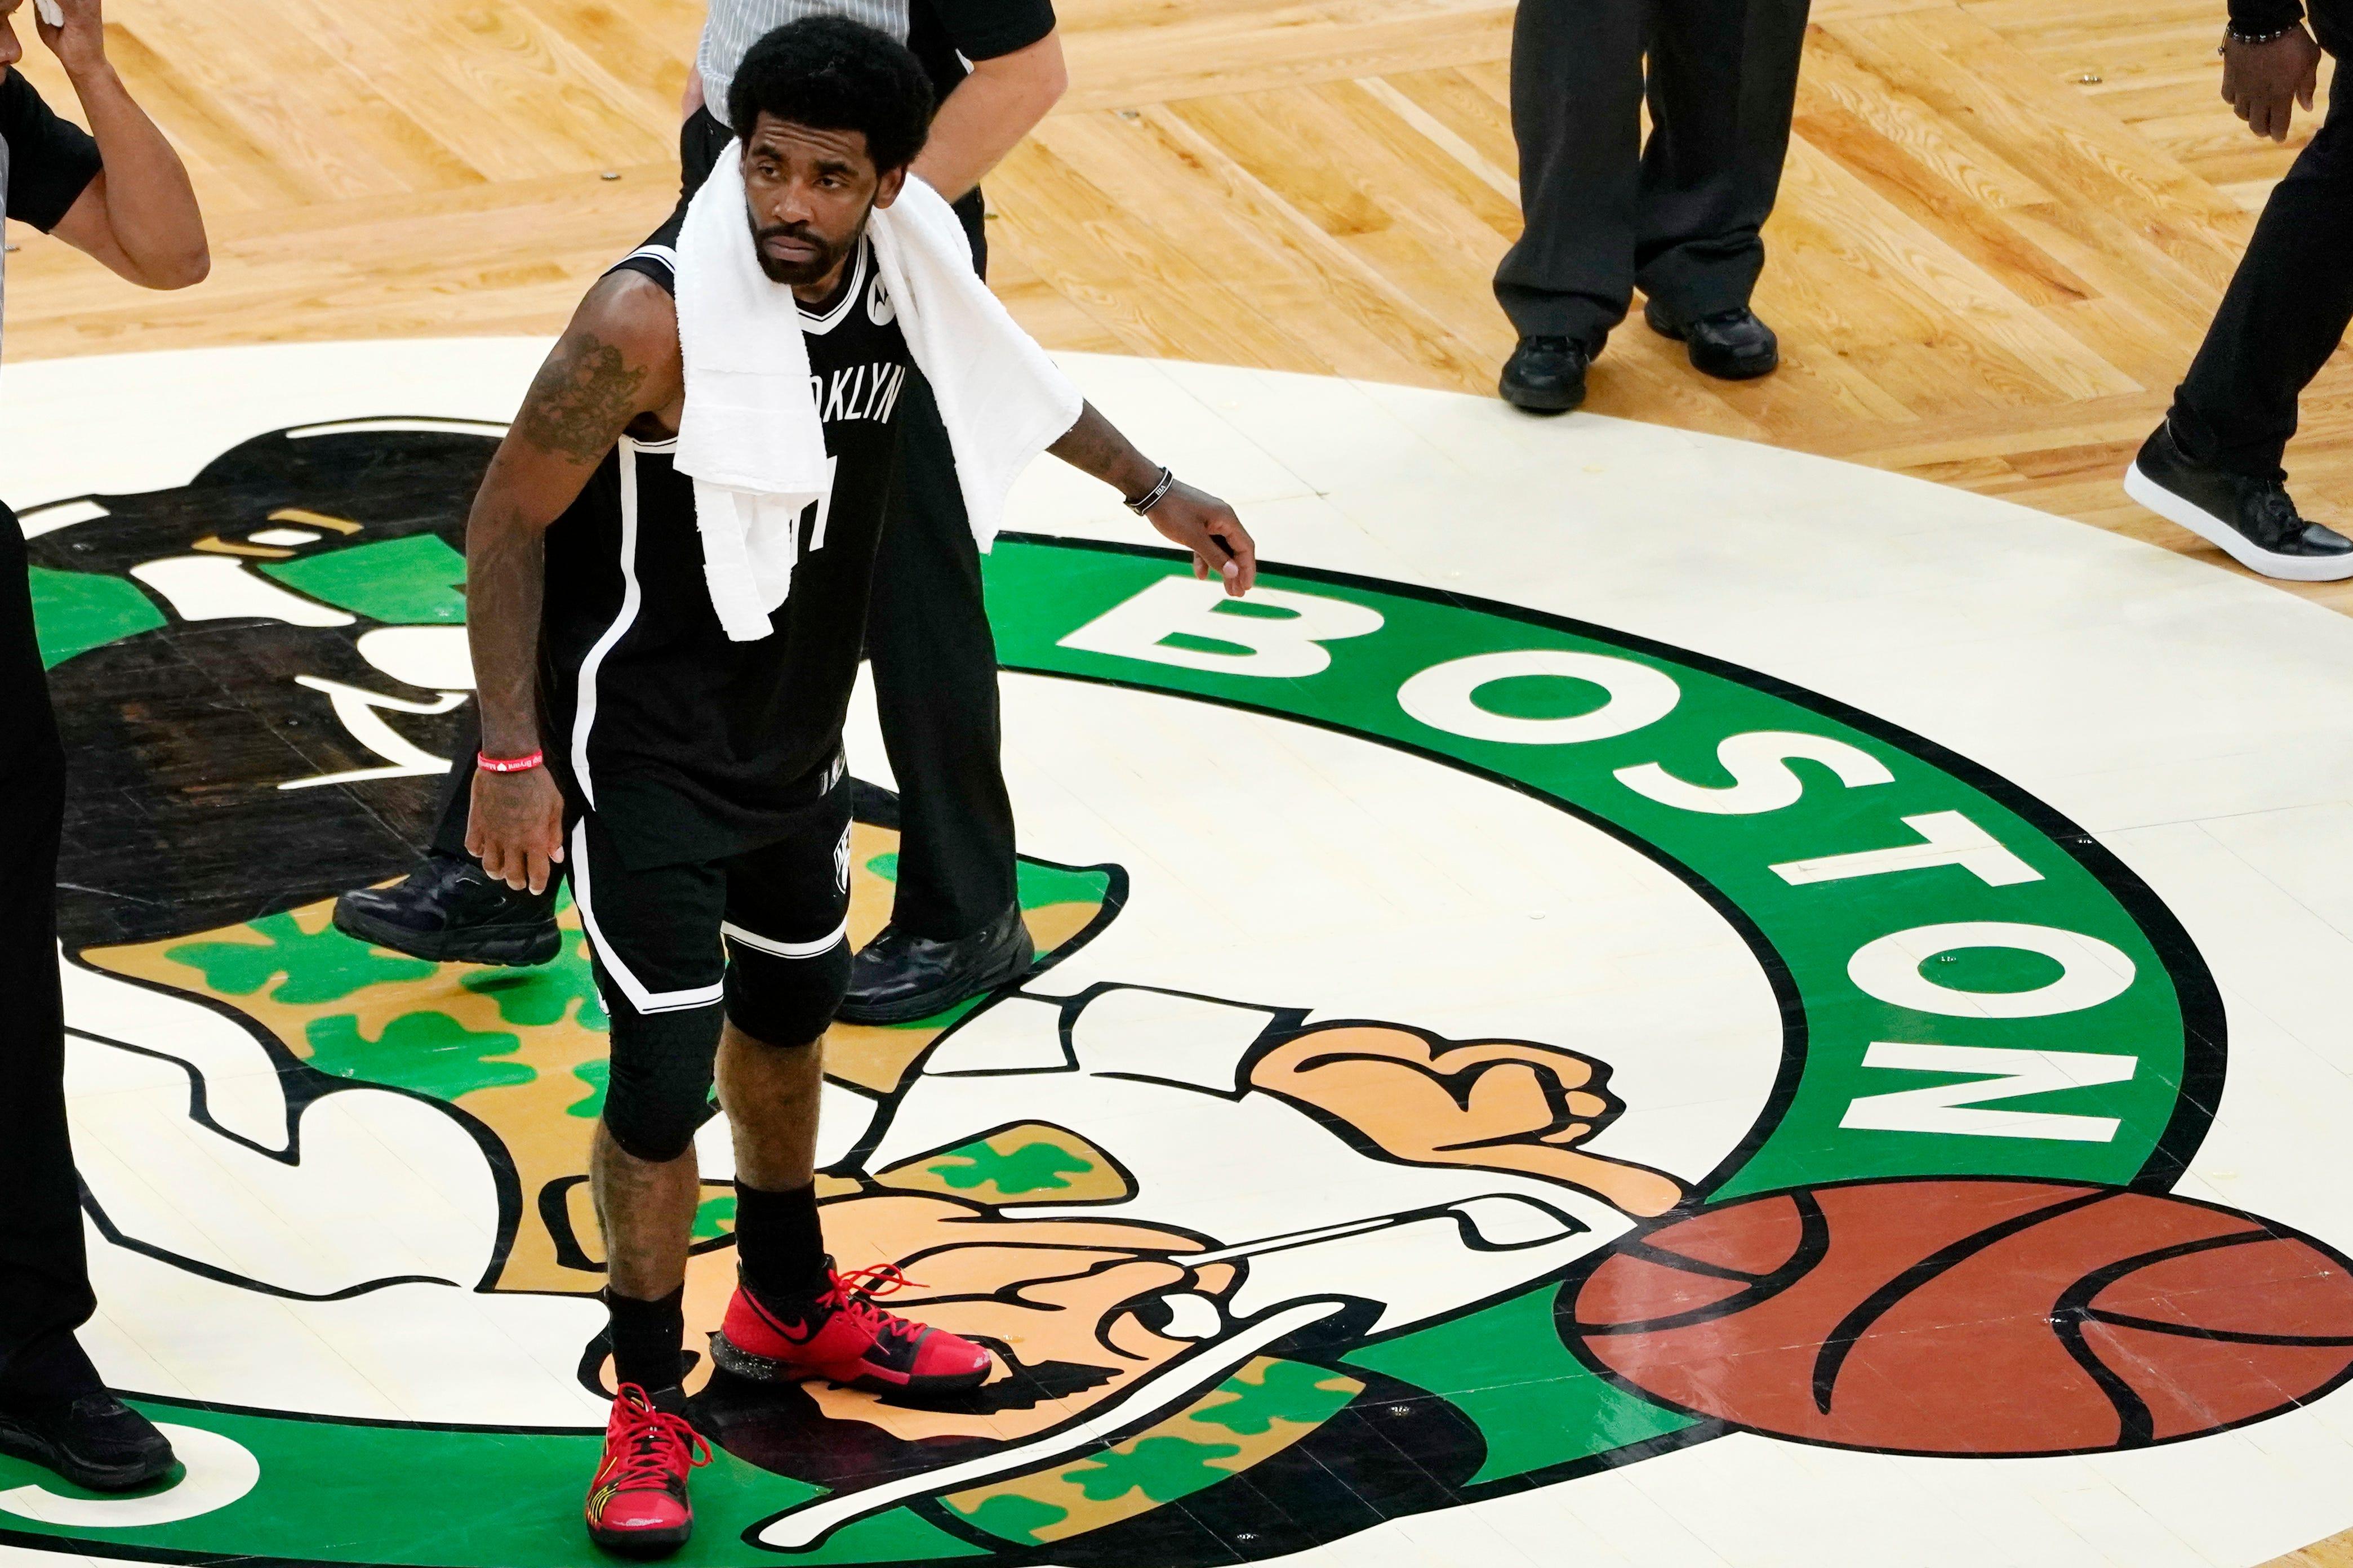 Kevin Garnett calls out Nets' Kyrie Irving for stepping on Celtics' logo